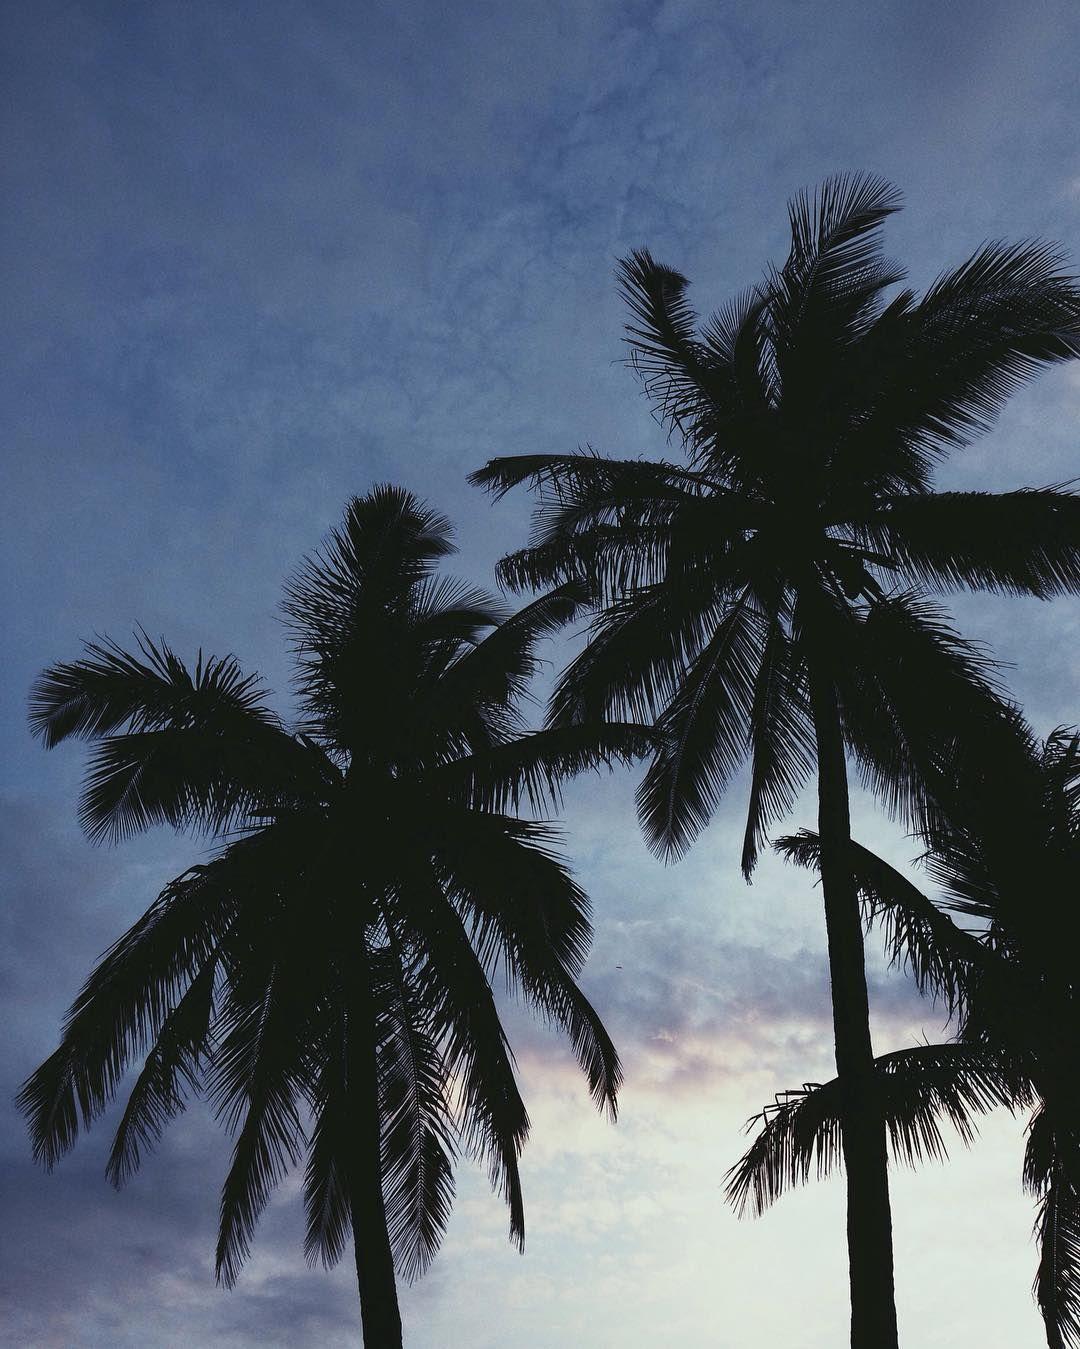 #paradis #palmtrese #sunset #summer #blue #lover #tropical #addict #etangsalé #nature #lareunion #974island #islandlife by li_ozawa_flood